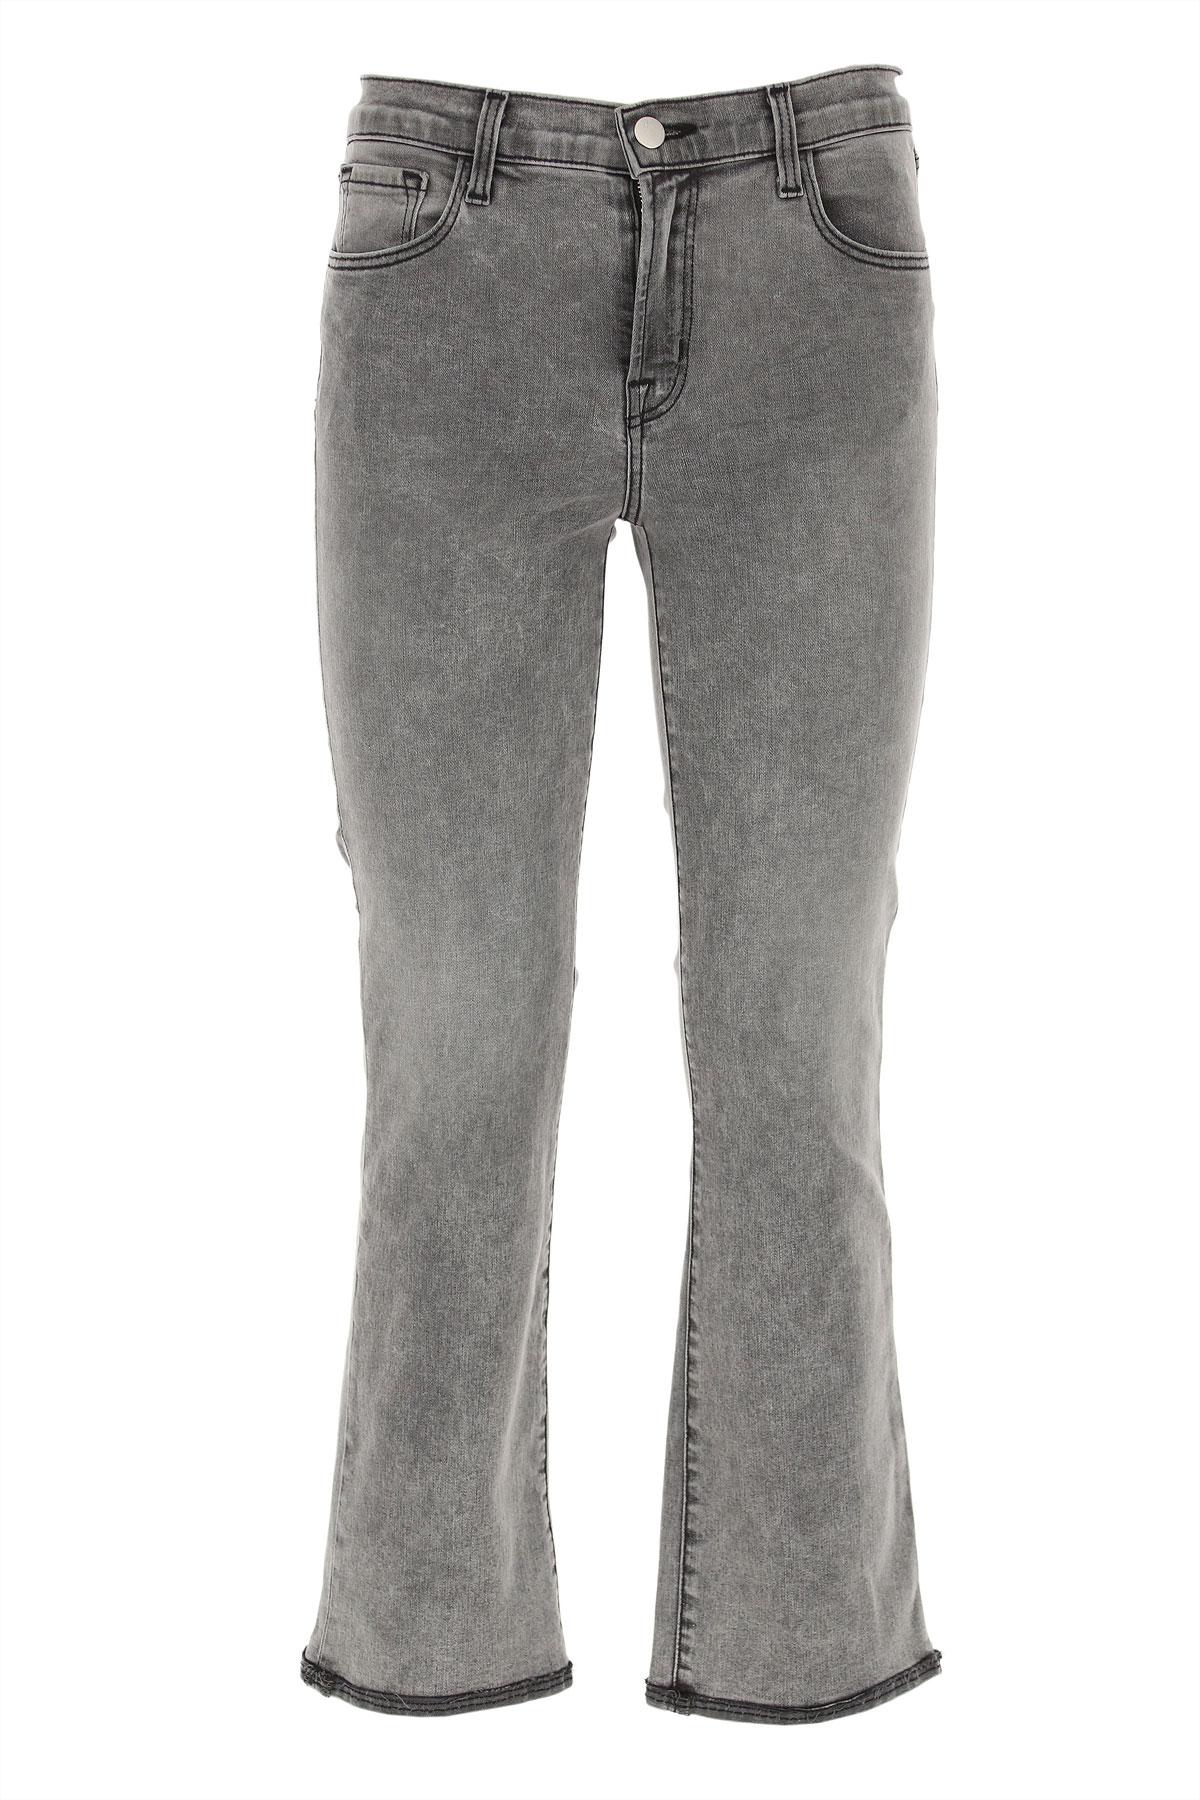 J Brand Jeans On Sale, Black, Cotton, 2019, 29 32